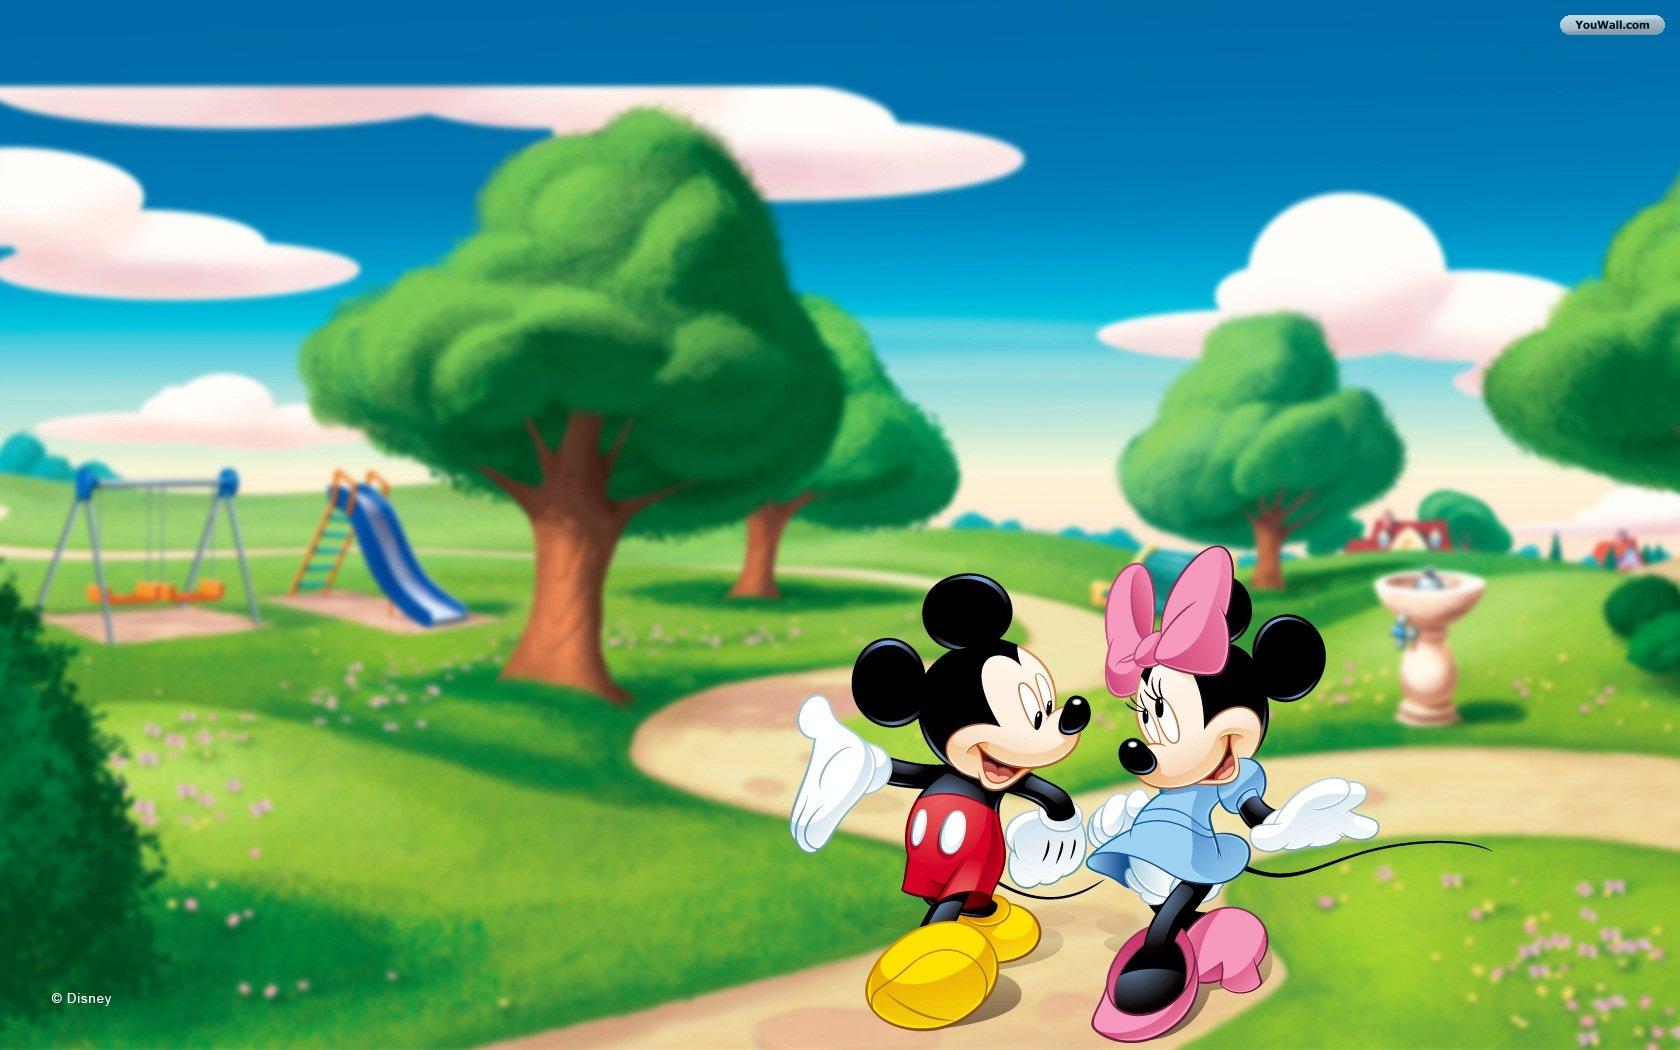 Mickey and Minnie Desktop Wallpaper - WallpaperSafari